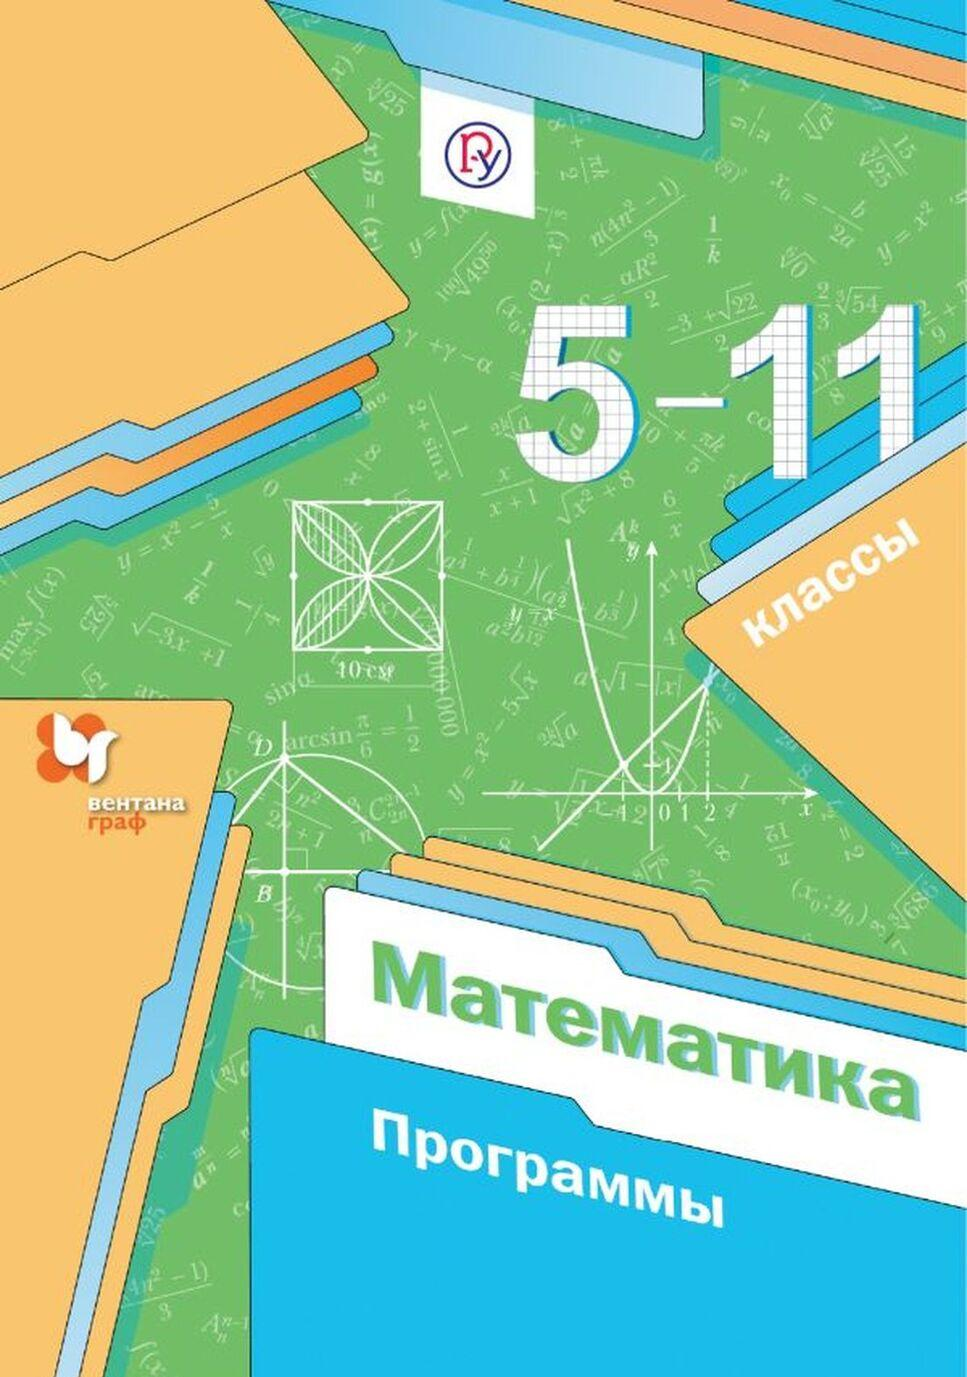 Matematika. 5-11klassy. Programmy | Merzljak Arkadij Grigorevich, Jakir Mikhail Semenovich